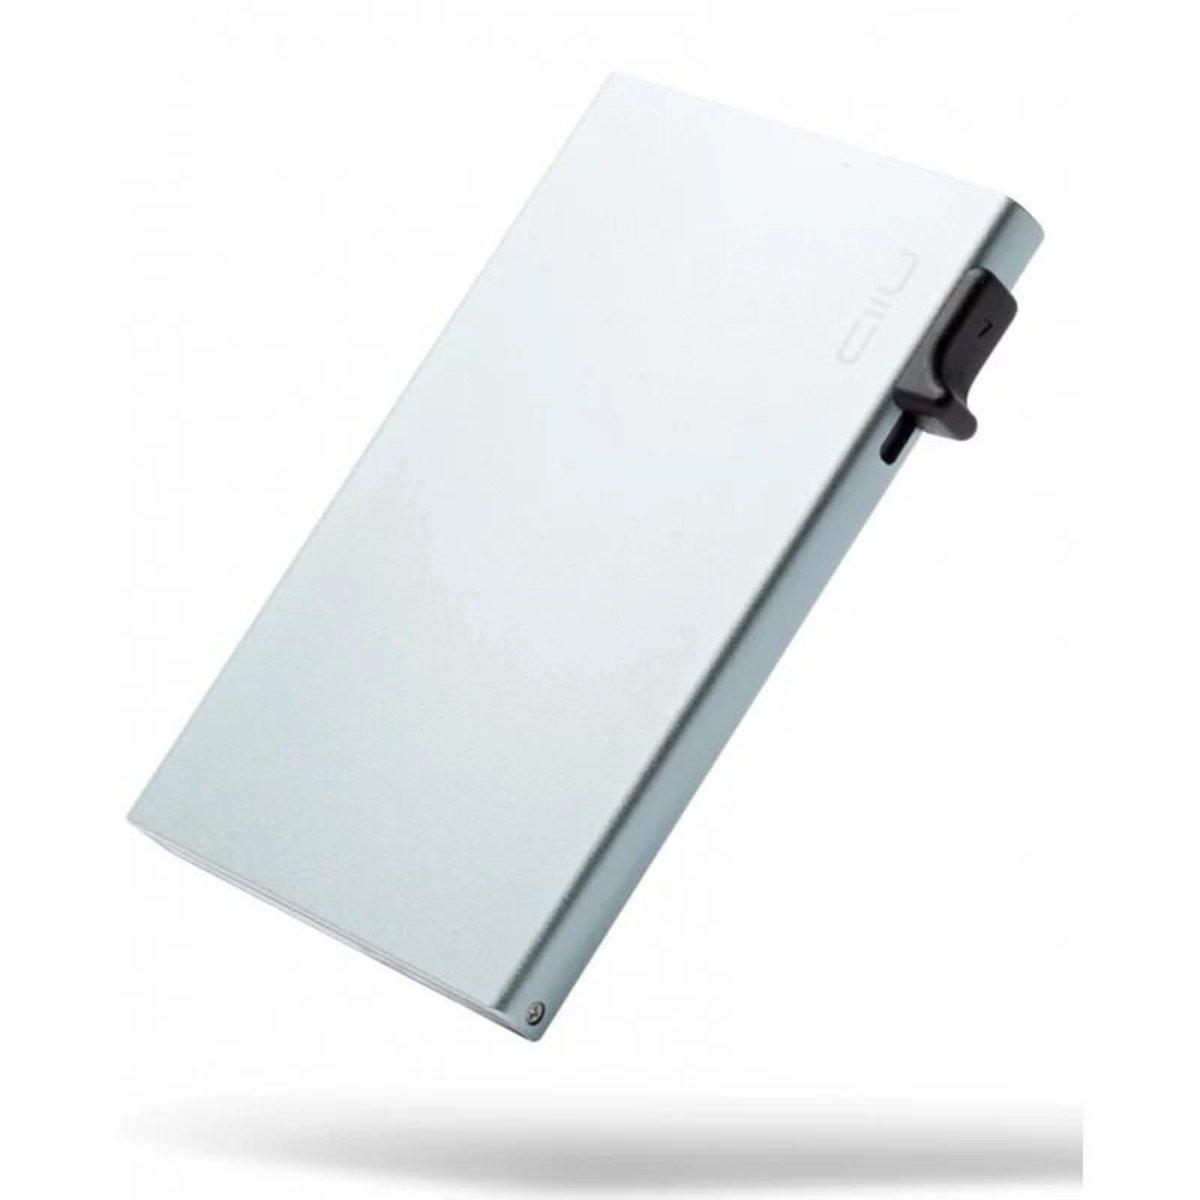 RFID Security Slide Card Protector 晶片卡防盜卡套 - Grey